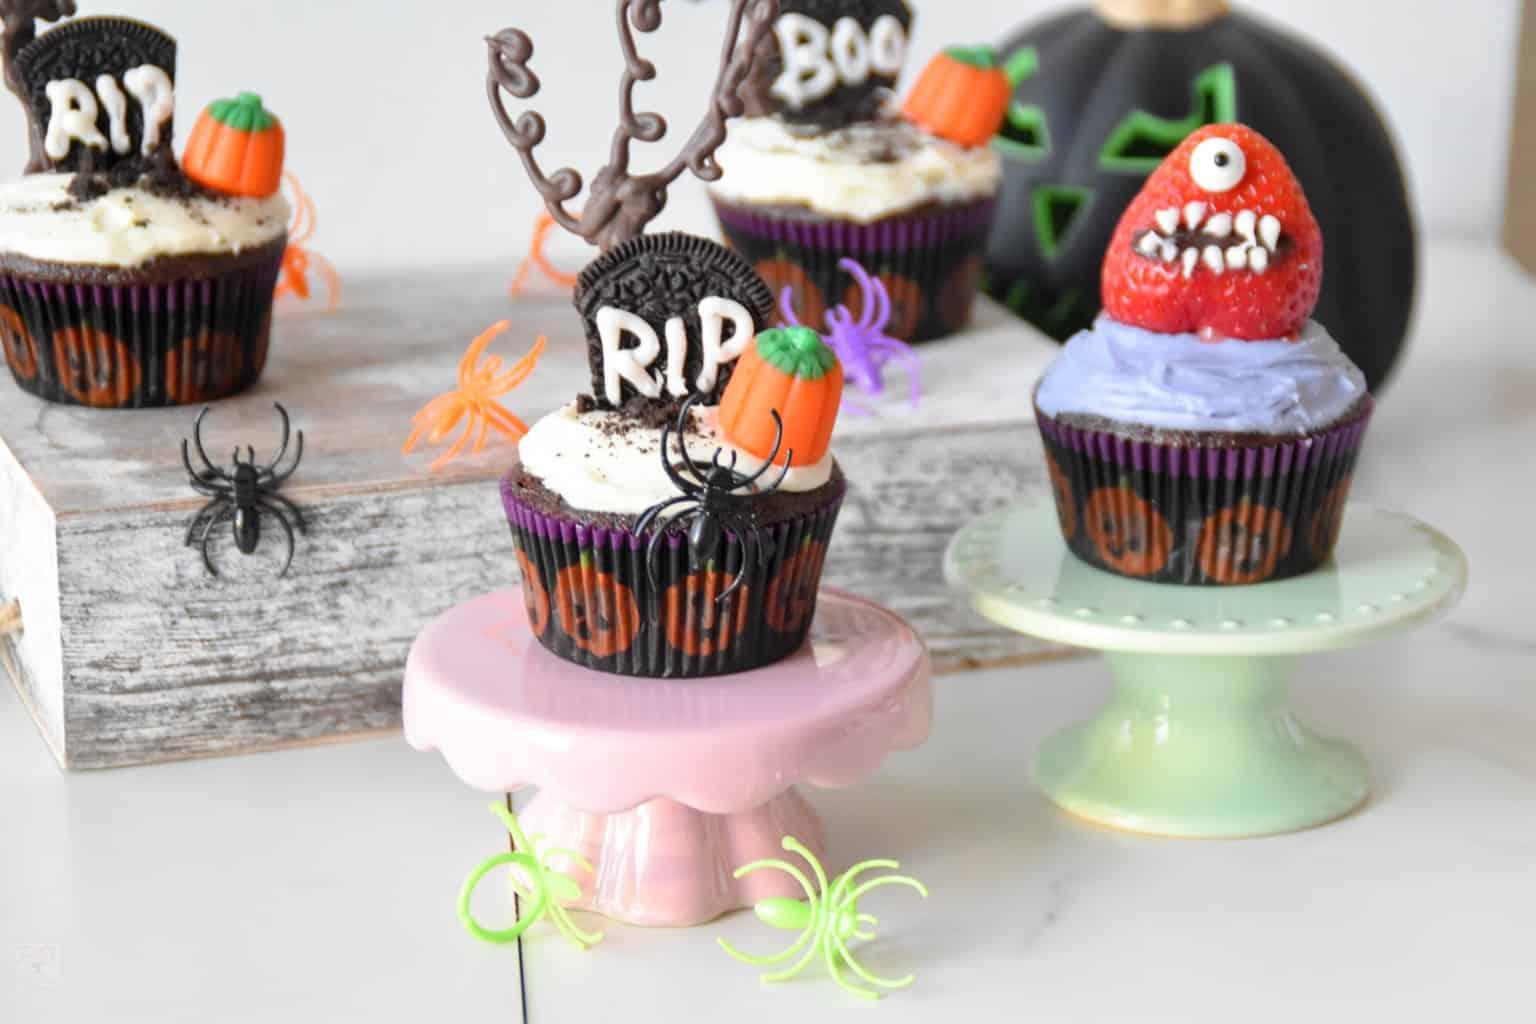 "<img src=""https://cdn.shortpixel.ai/client/q_glossy,ret_img,w_4096,h_2730/Halloween cupcakes.jpg"" alt=""Graveyard cupcakes "">"